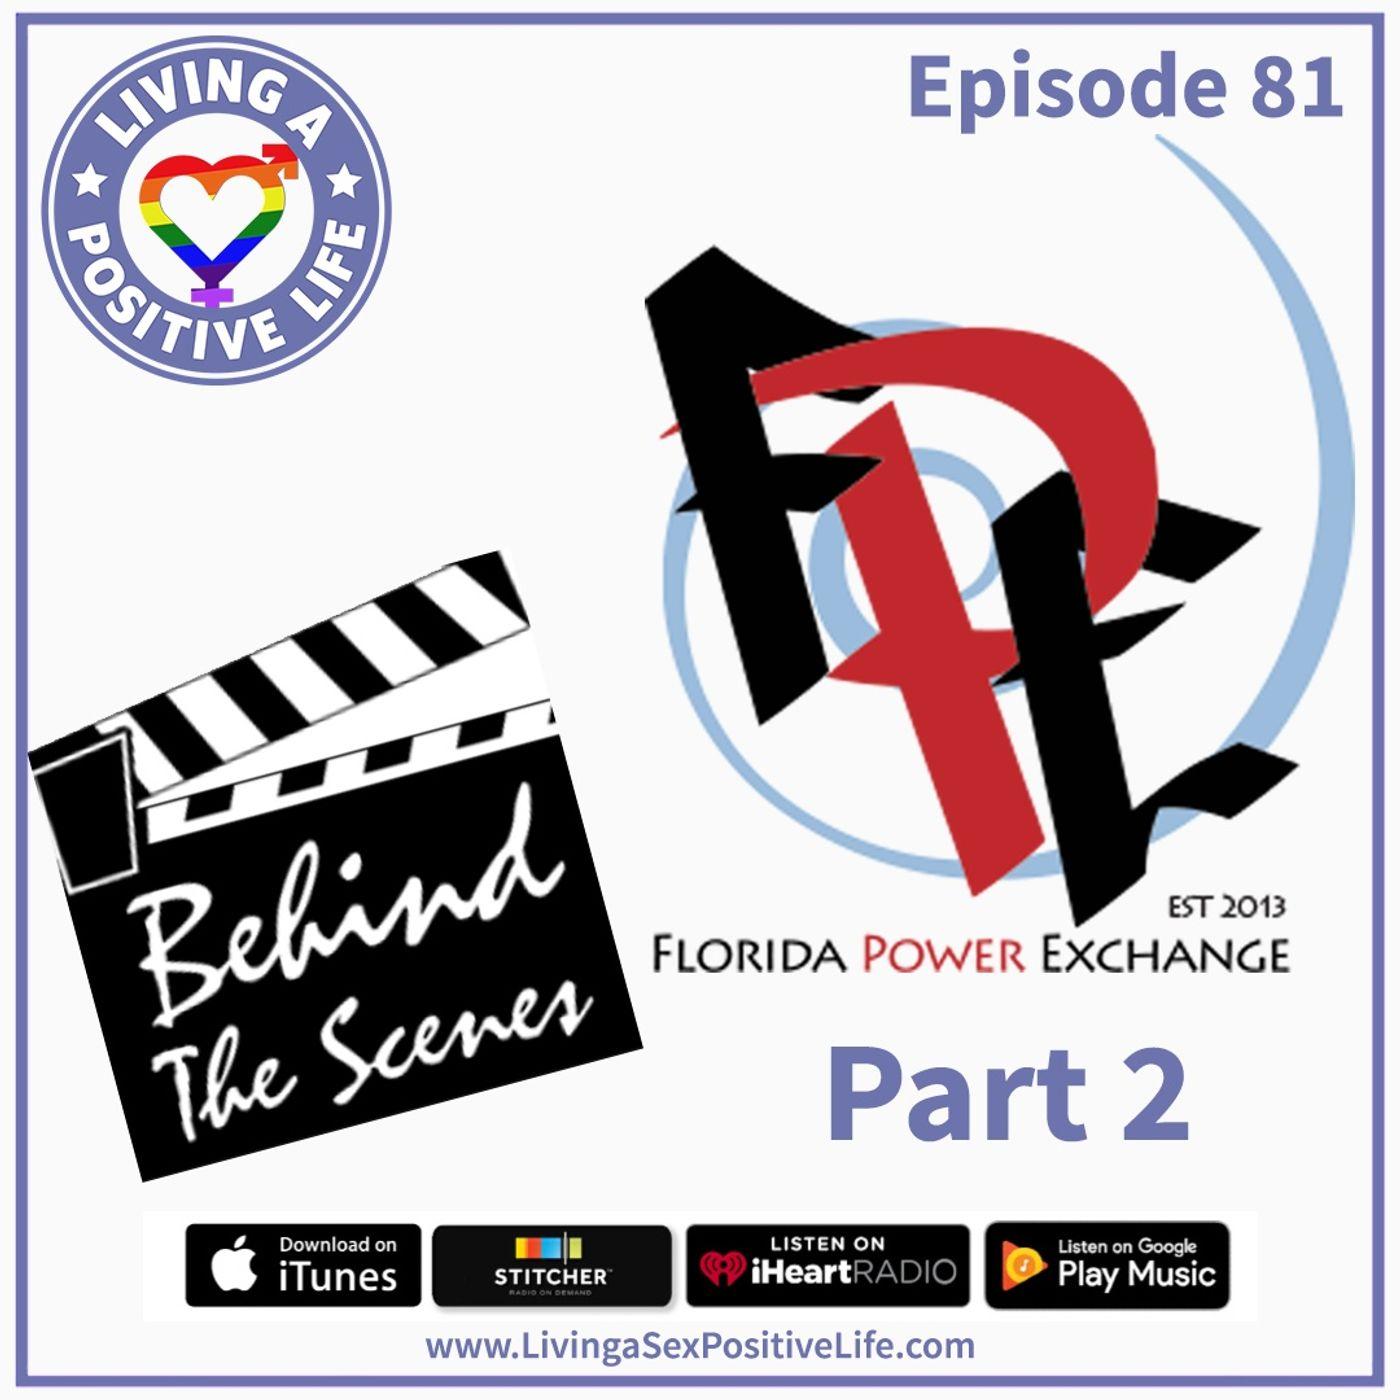 Sex Positive Me - E81: Florida Power Exchange Behind the Scenes Part 2